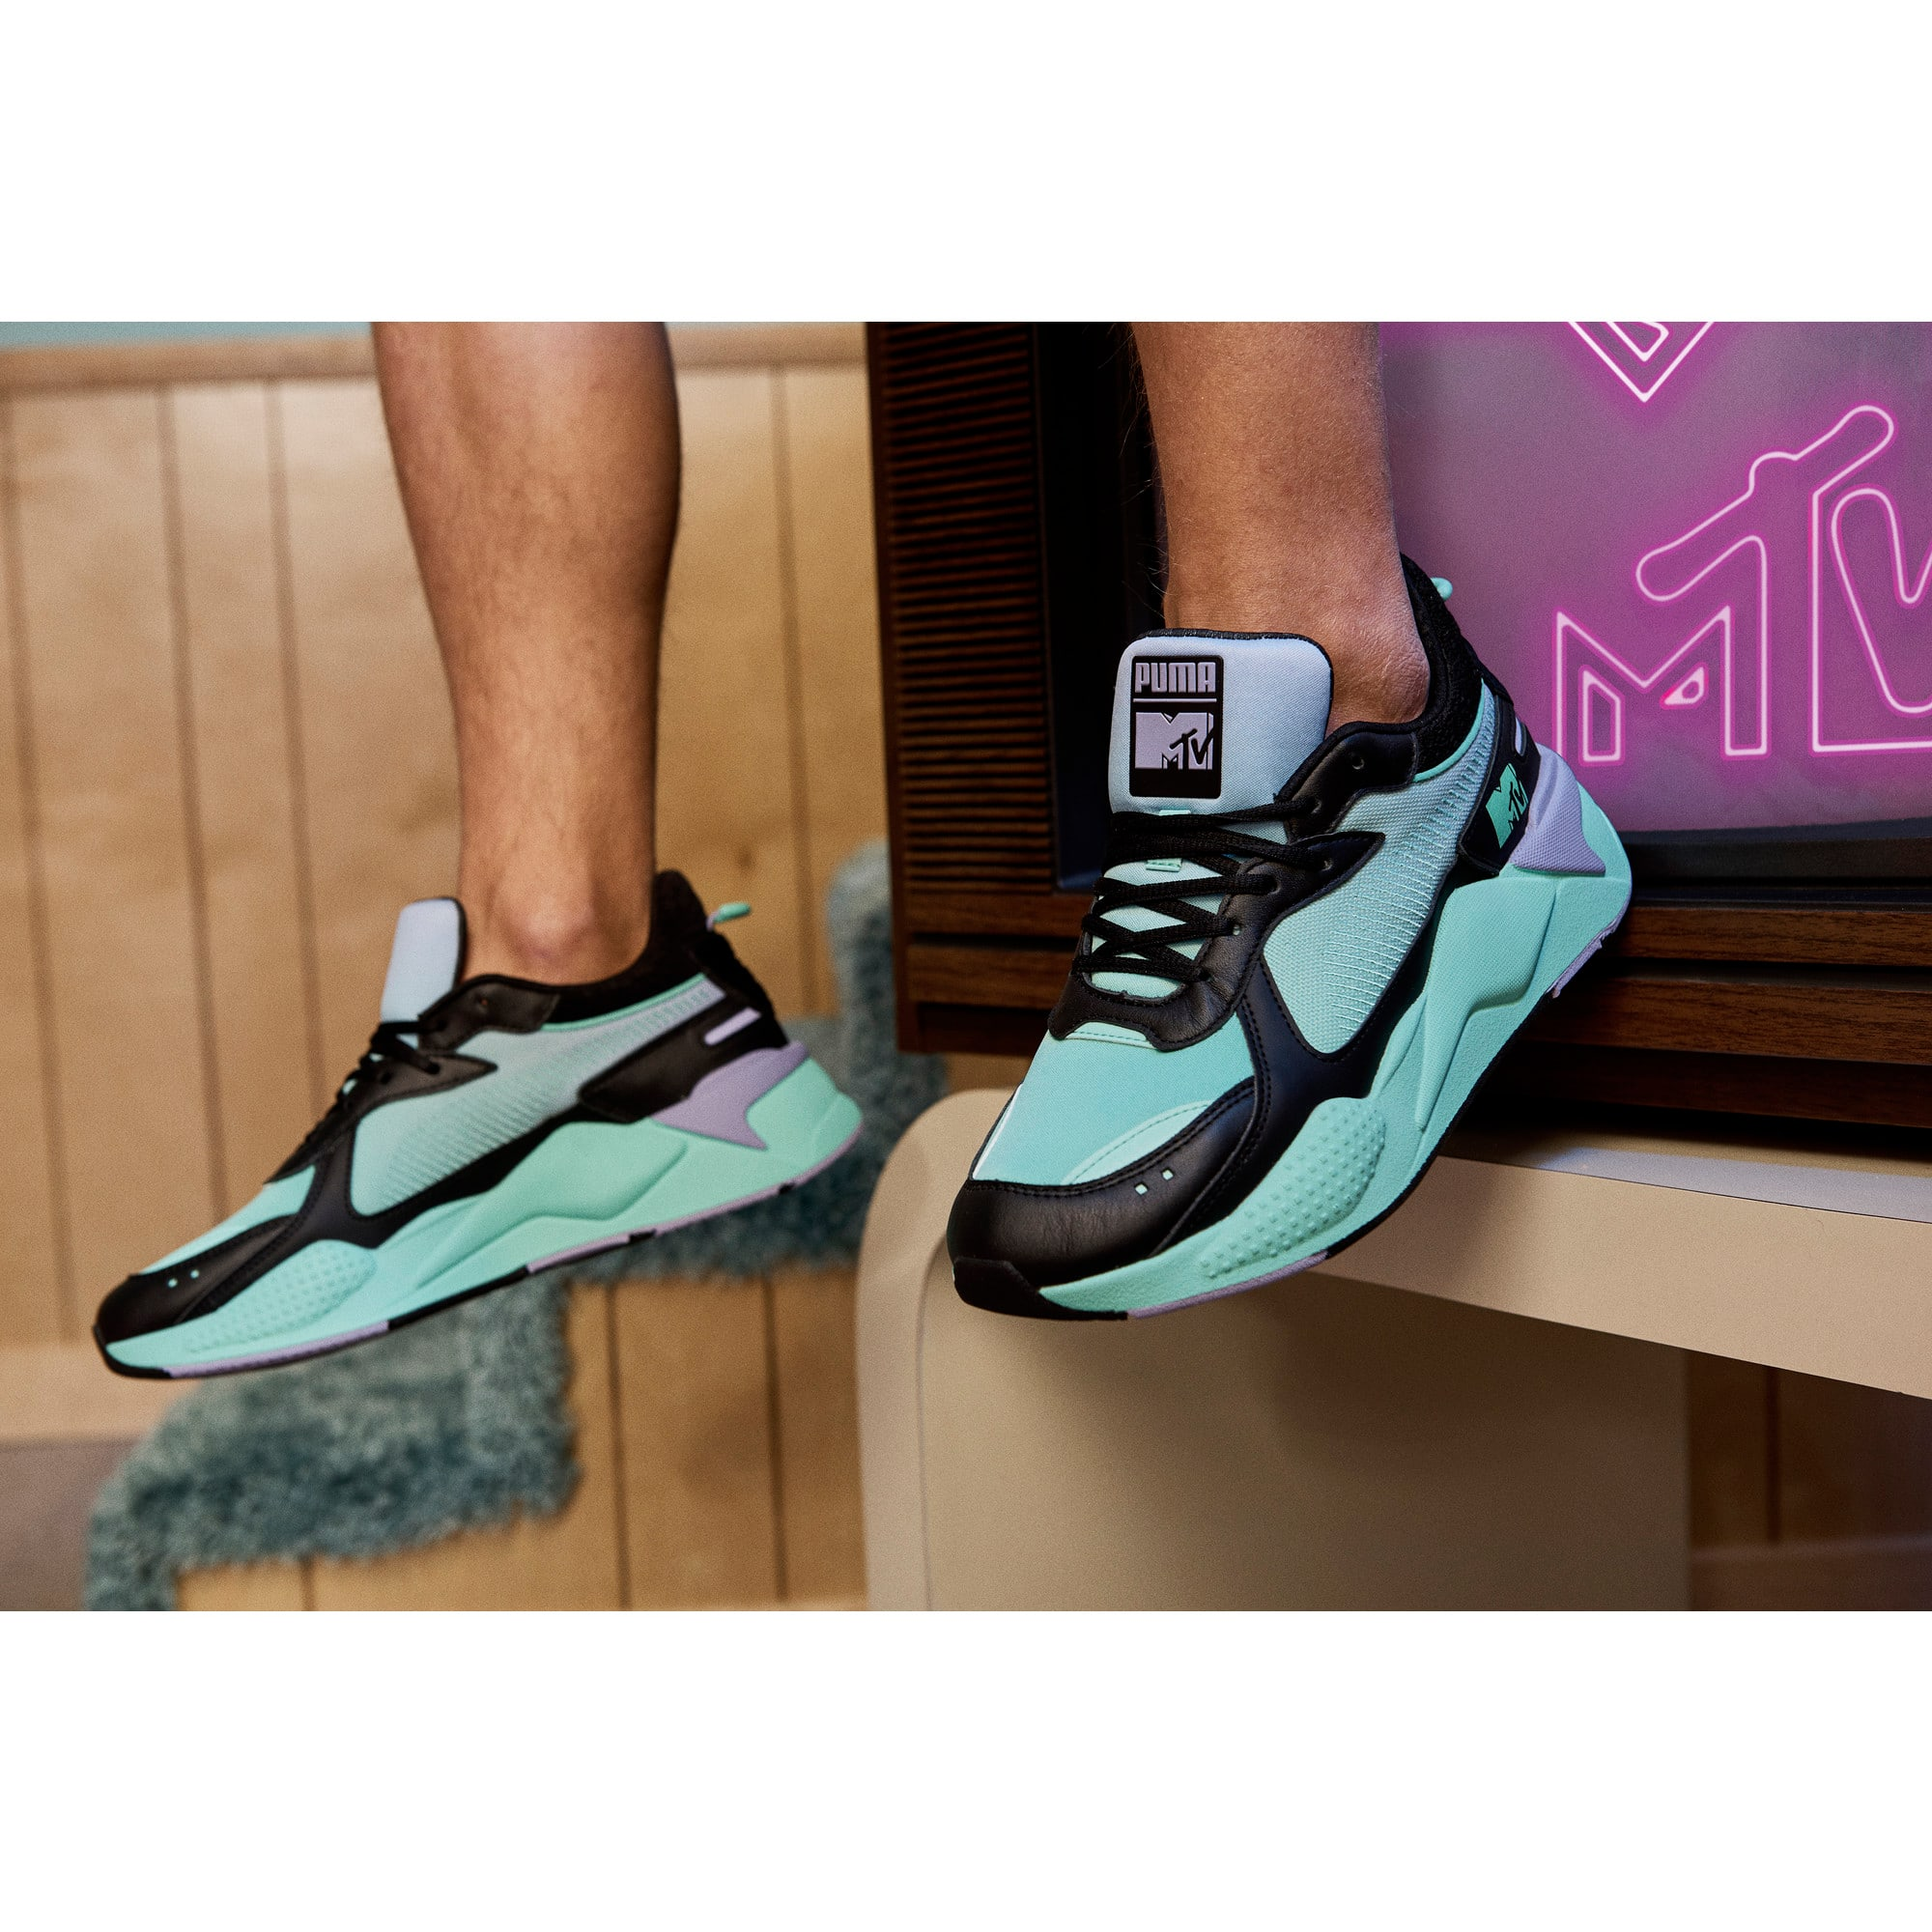 Thumbnail 7 of RS-X Tracks MTV Gradient Gloom Sneakers, Puma Black-Sweet Lavender, medium